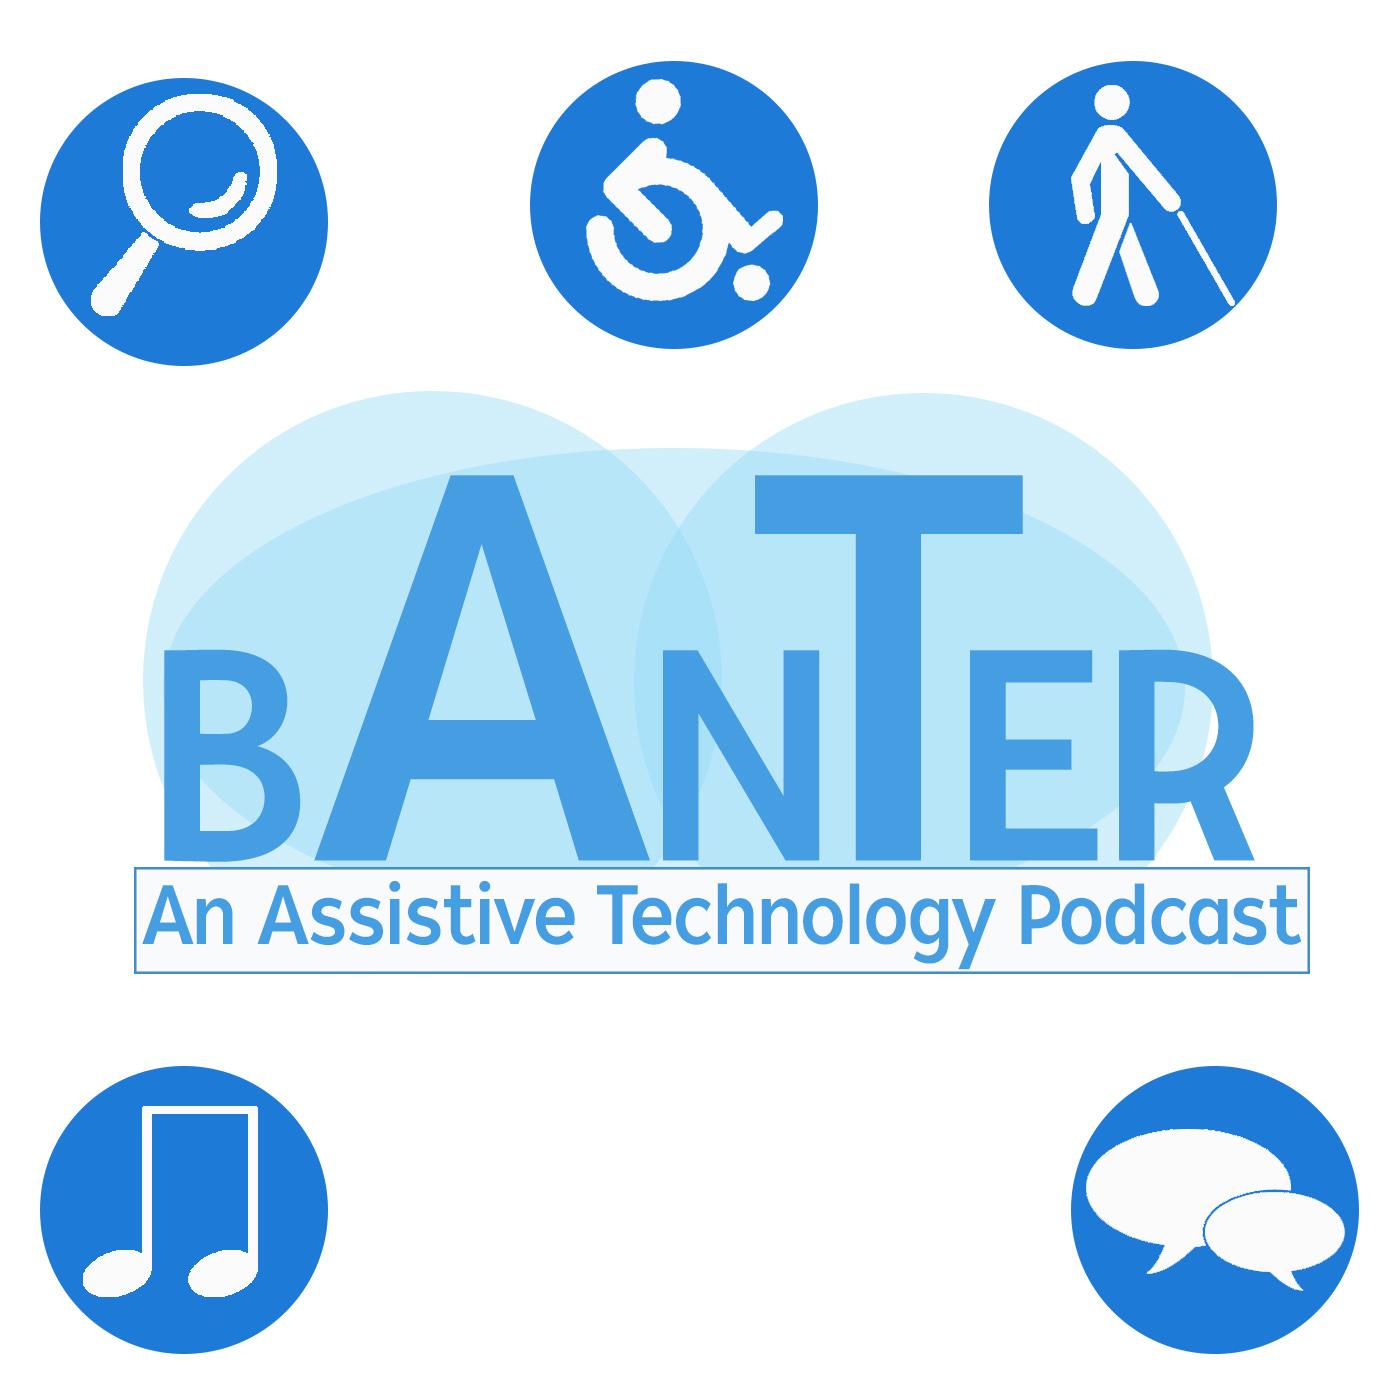 AT Banter Podcast